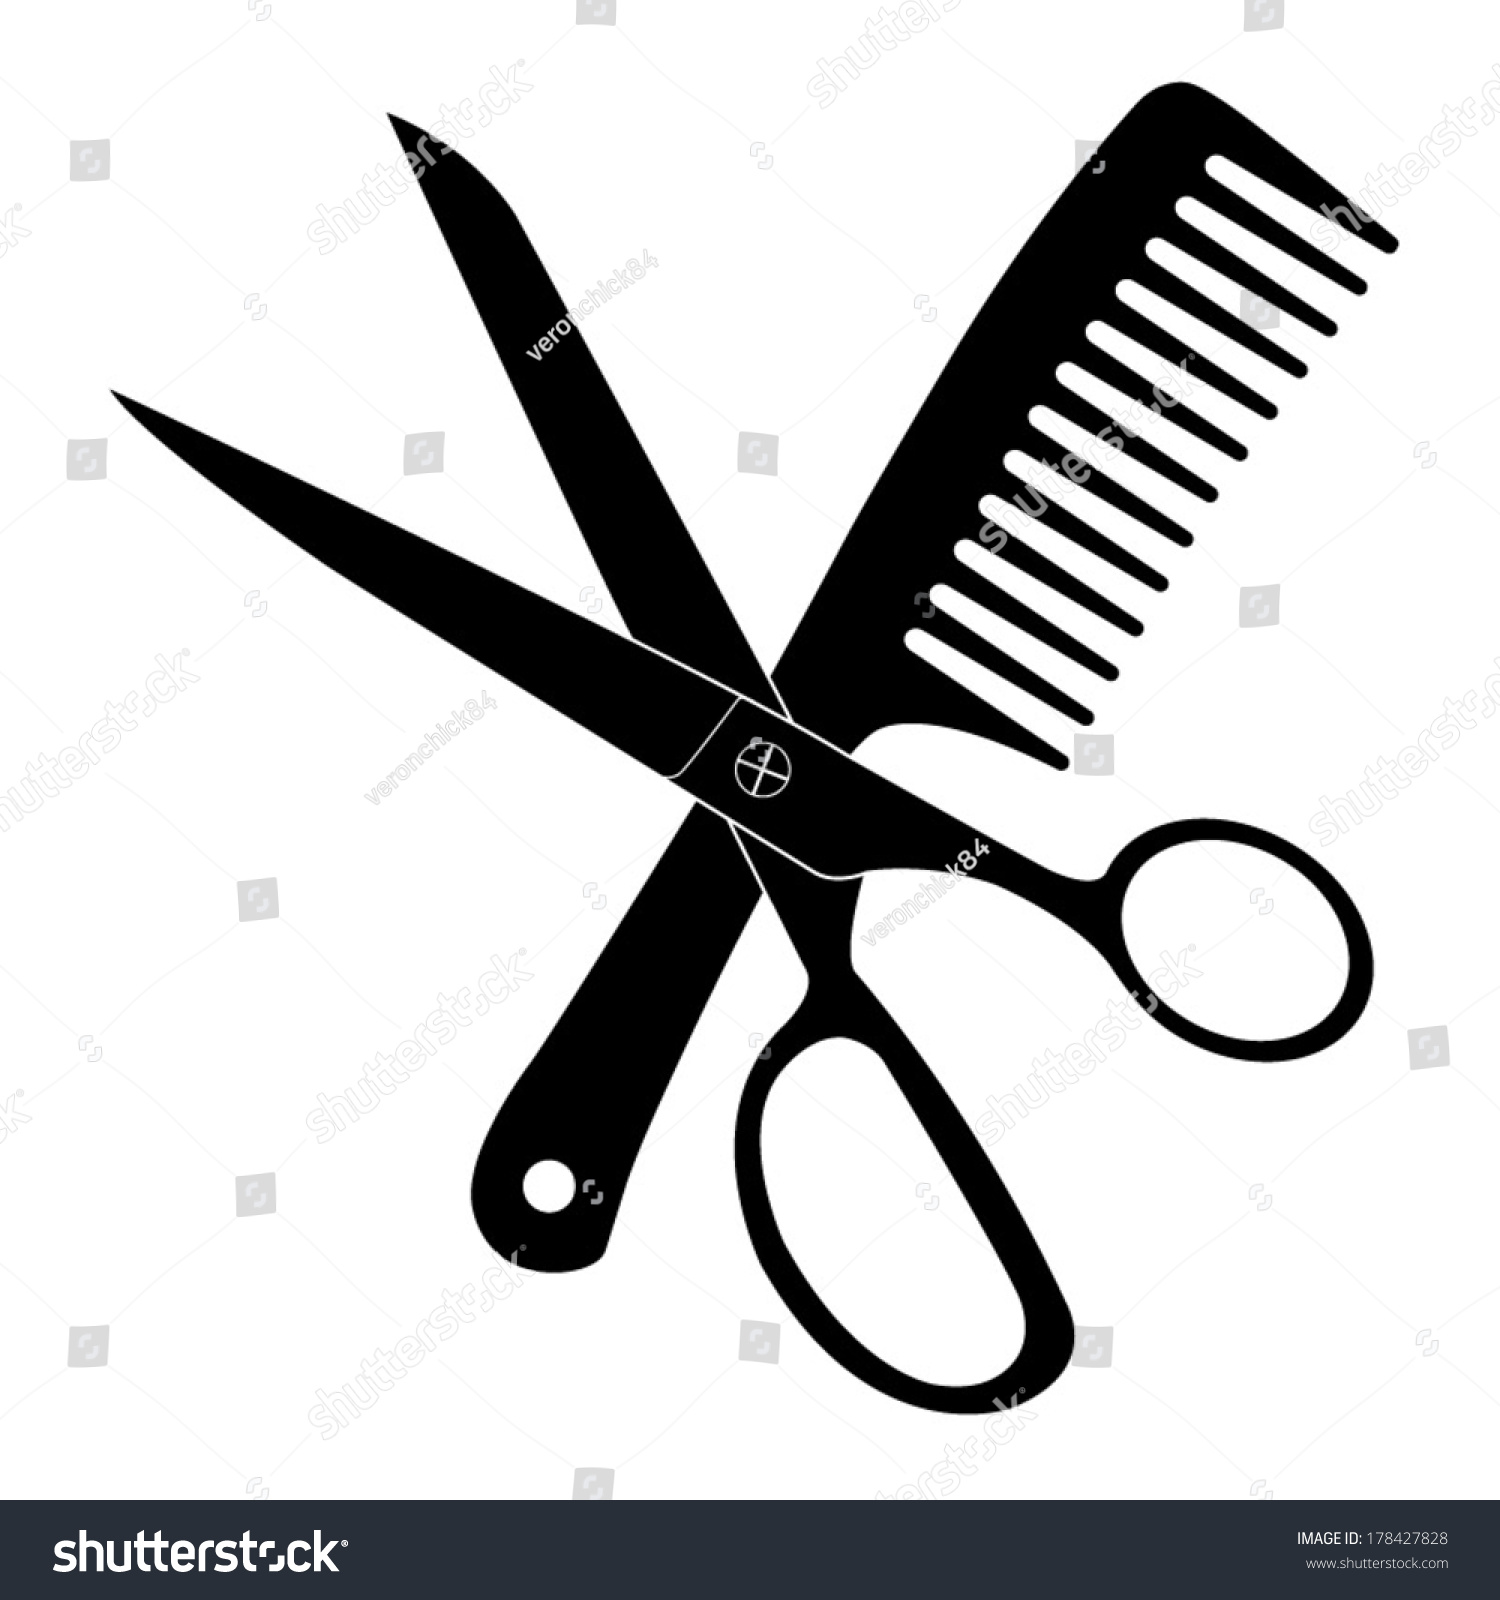 hair stylist scissors vector - photo #20